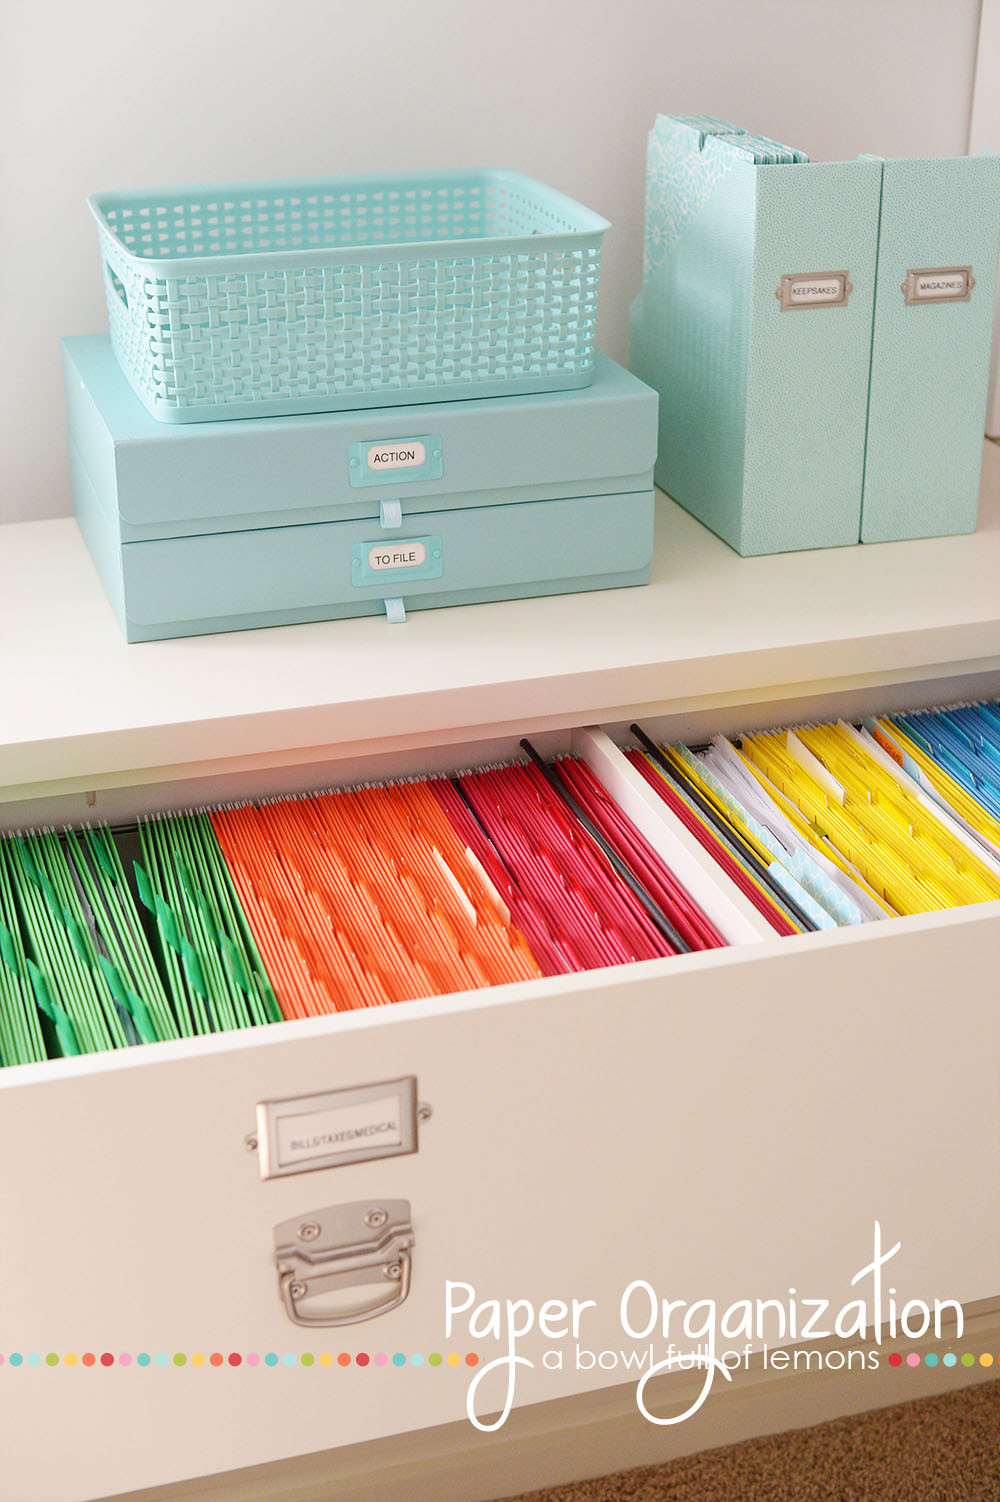 Paper organization Luxury Paper organization